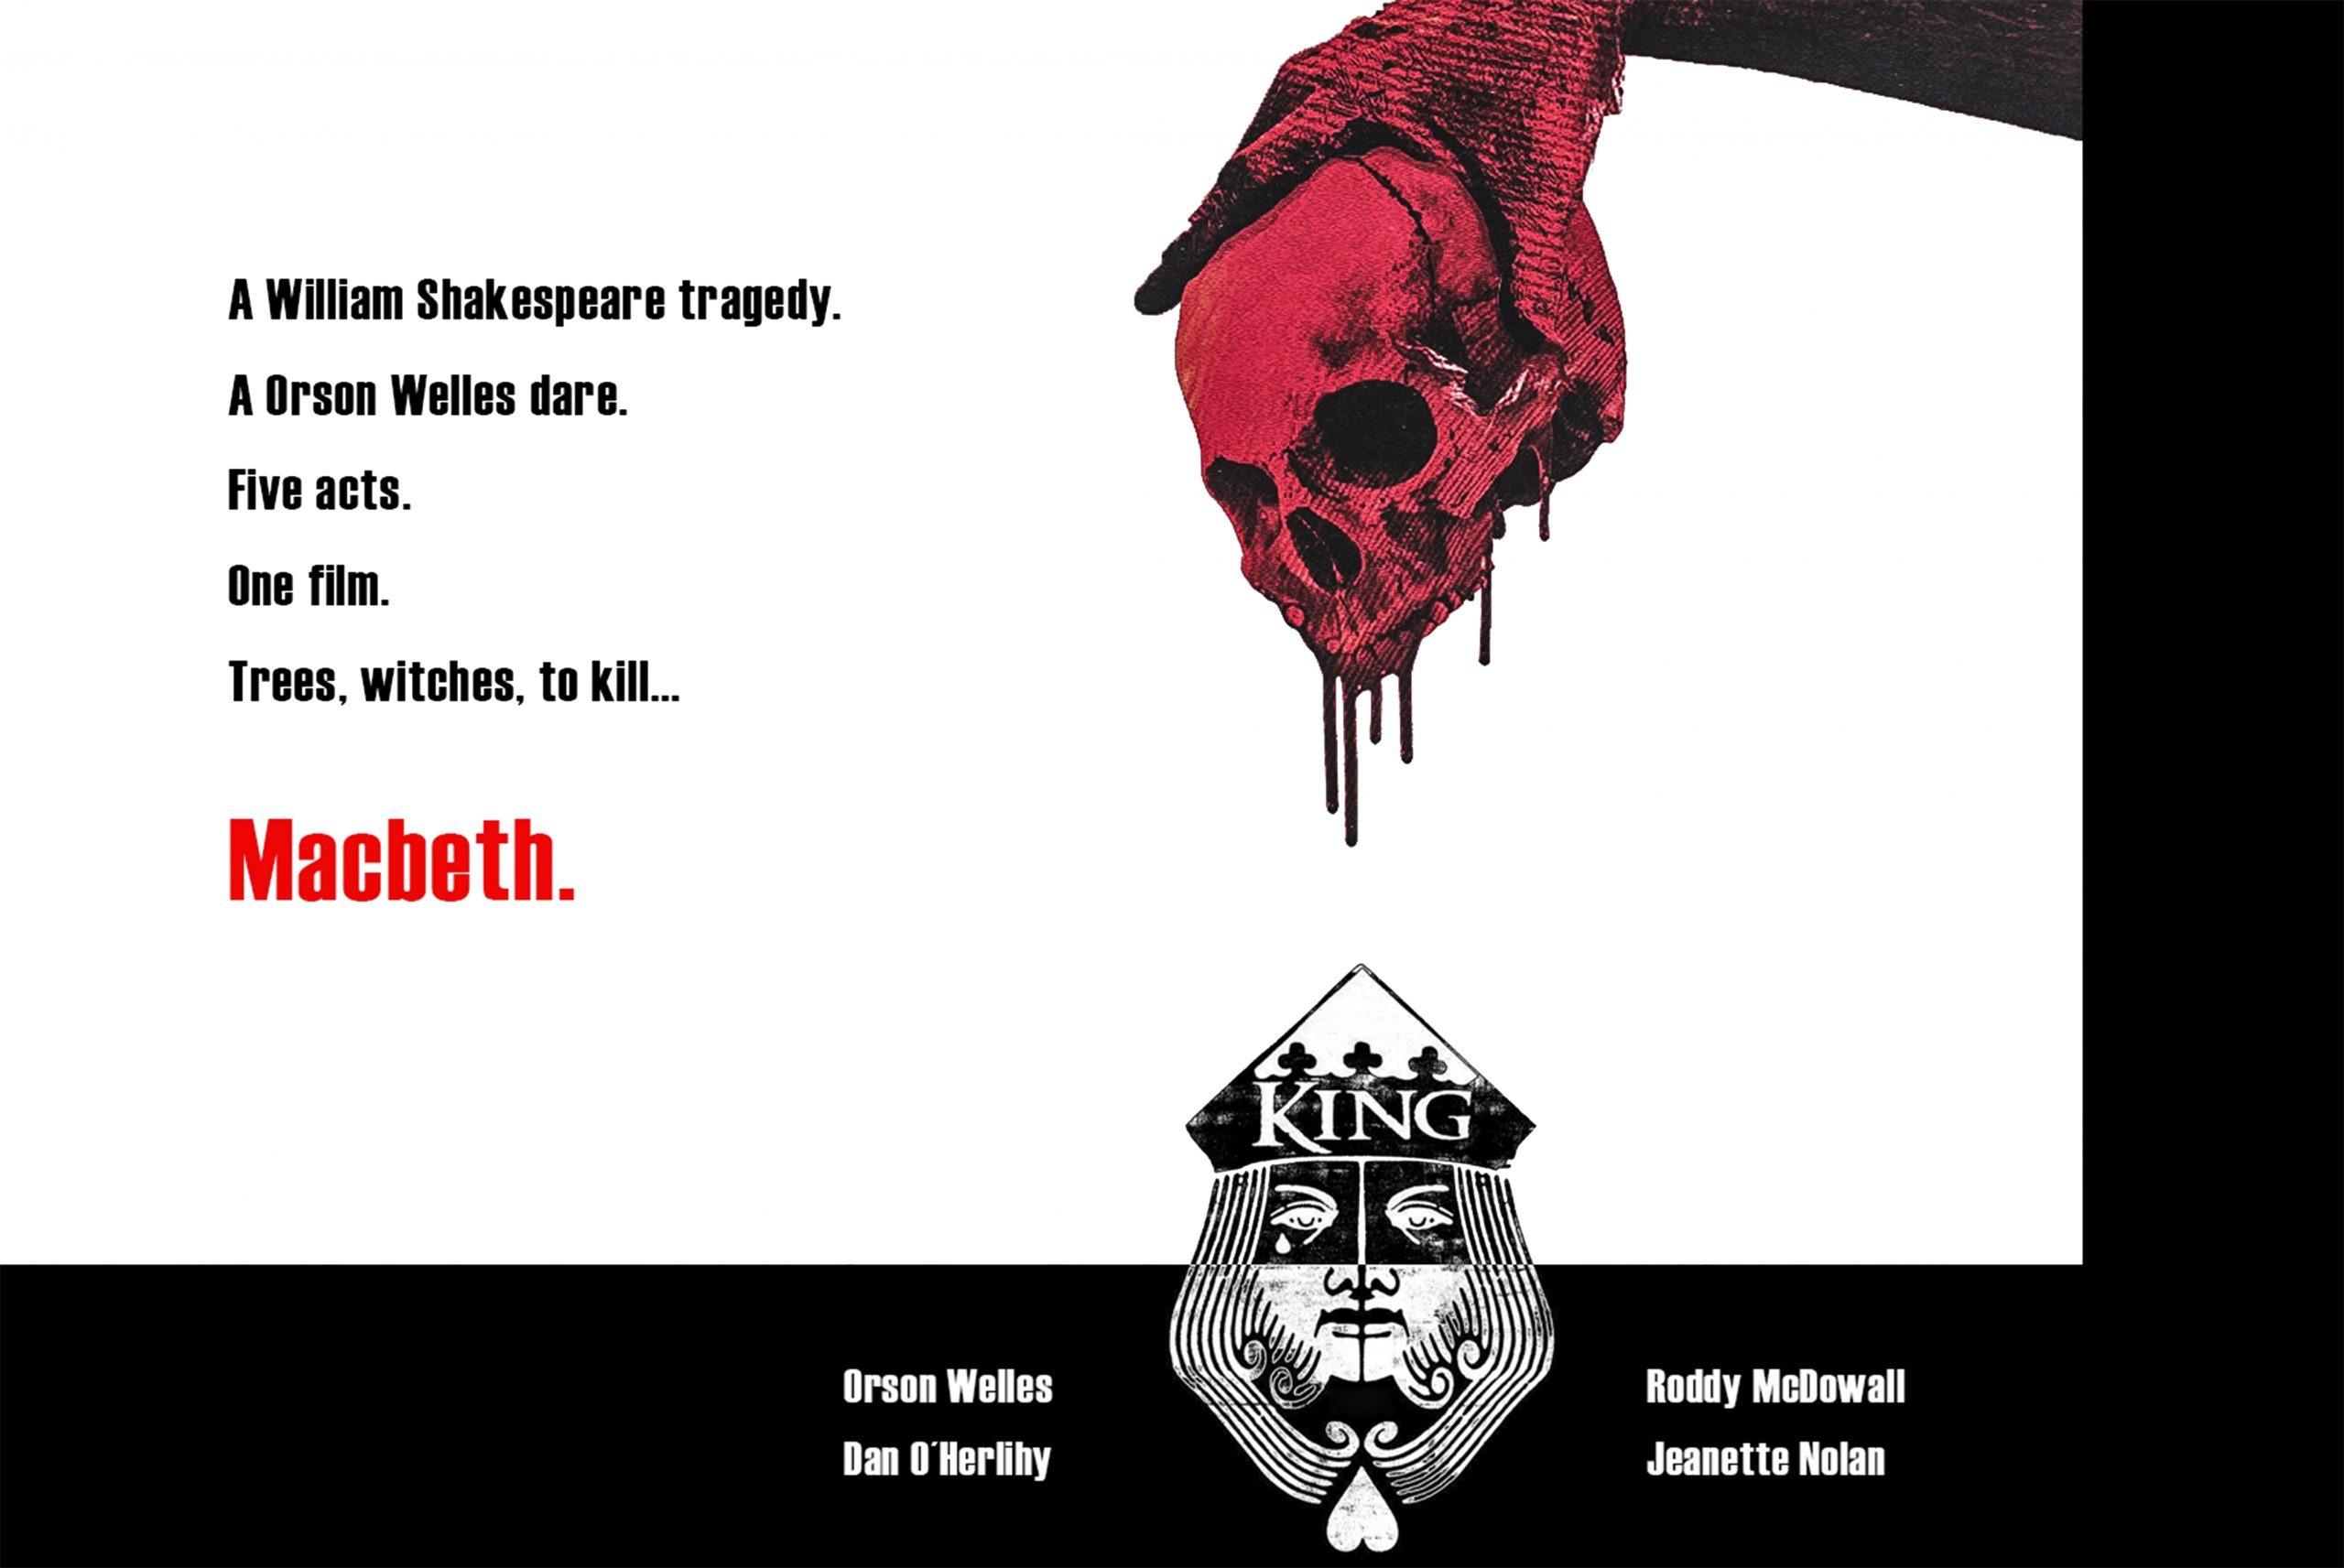 Macbeth. (Orson Welles. 1948.)